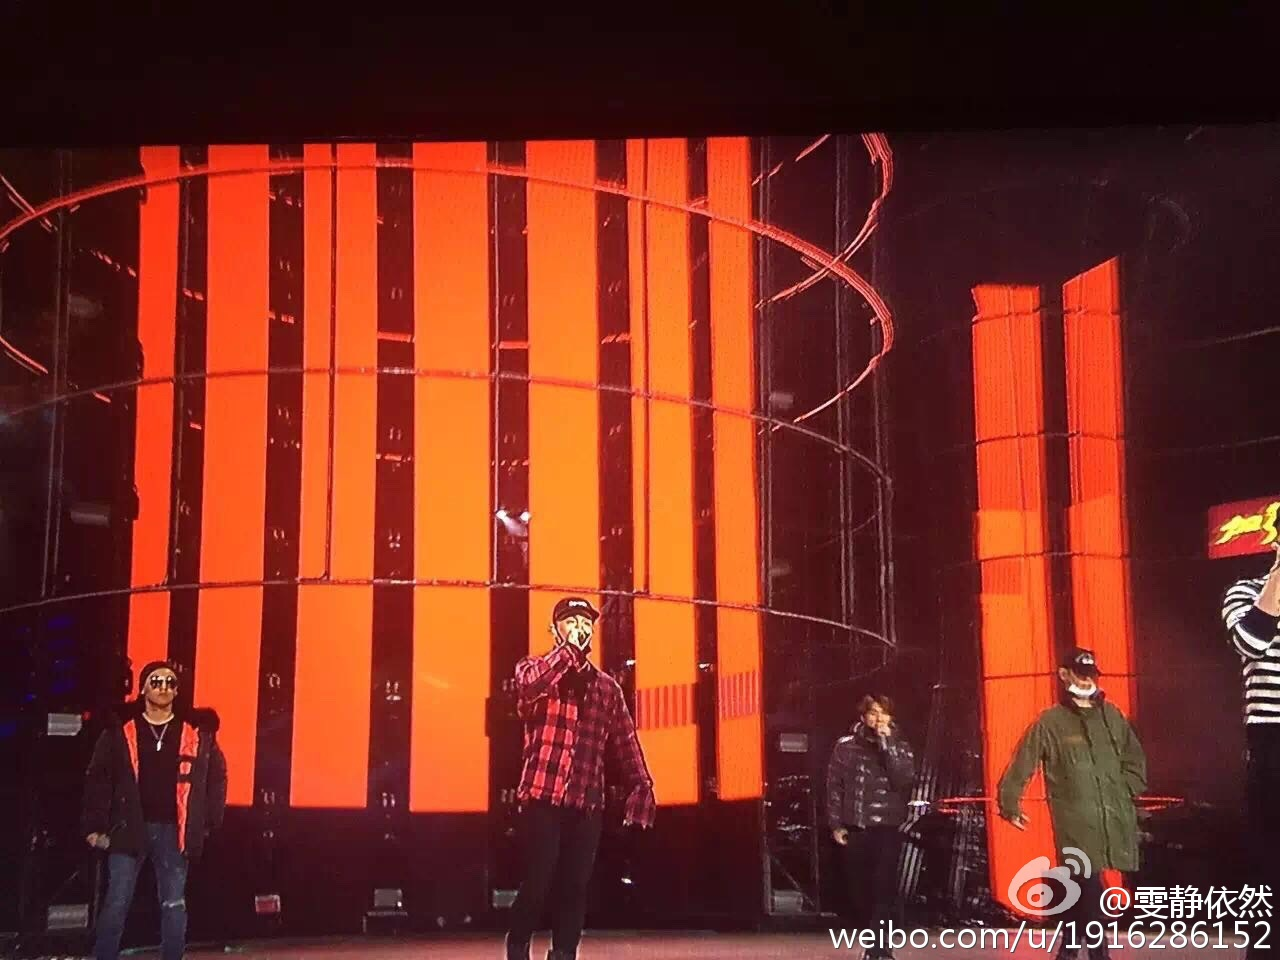 BIGBANG Rehearsals Hunan TV 31-12-2015 (2)